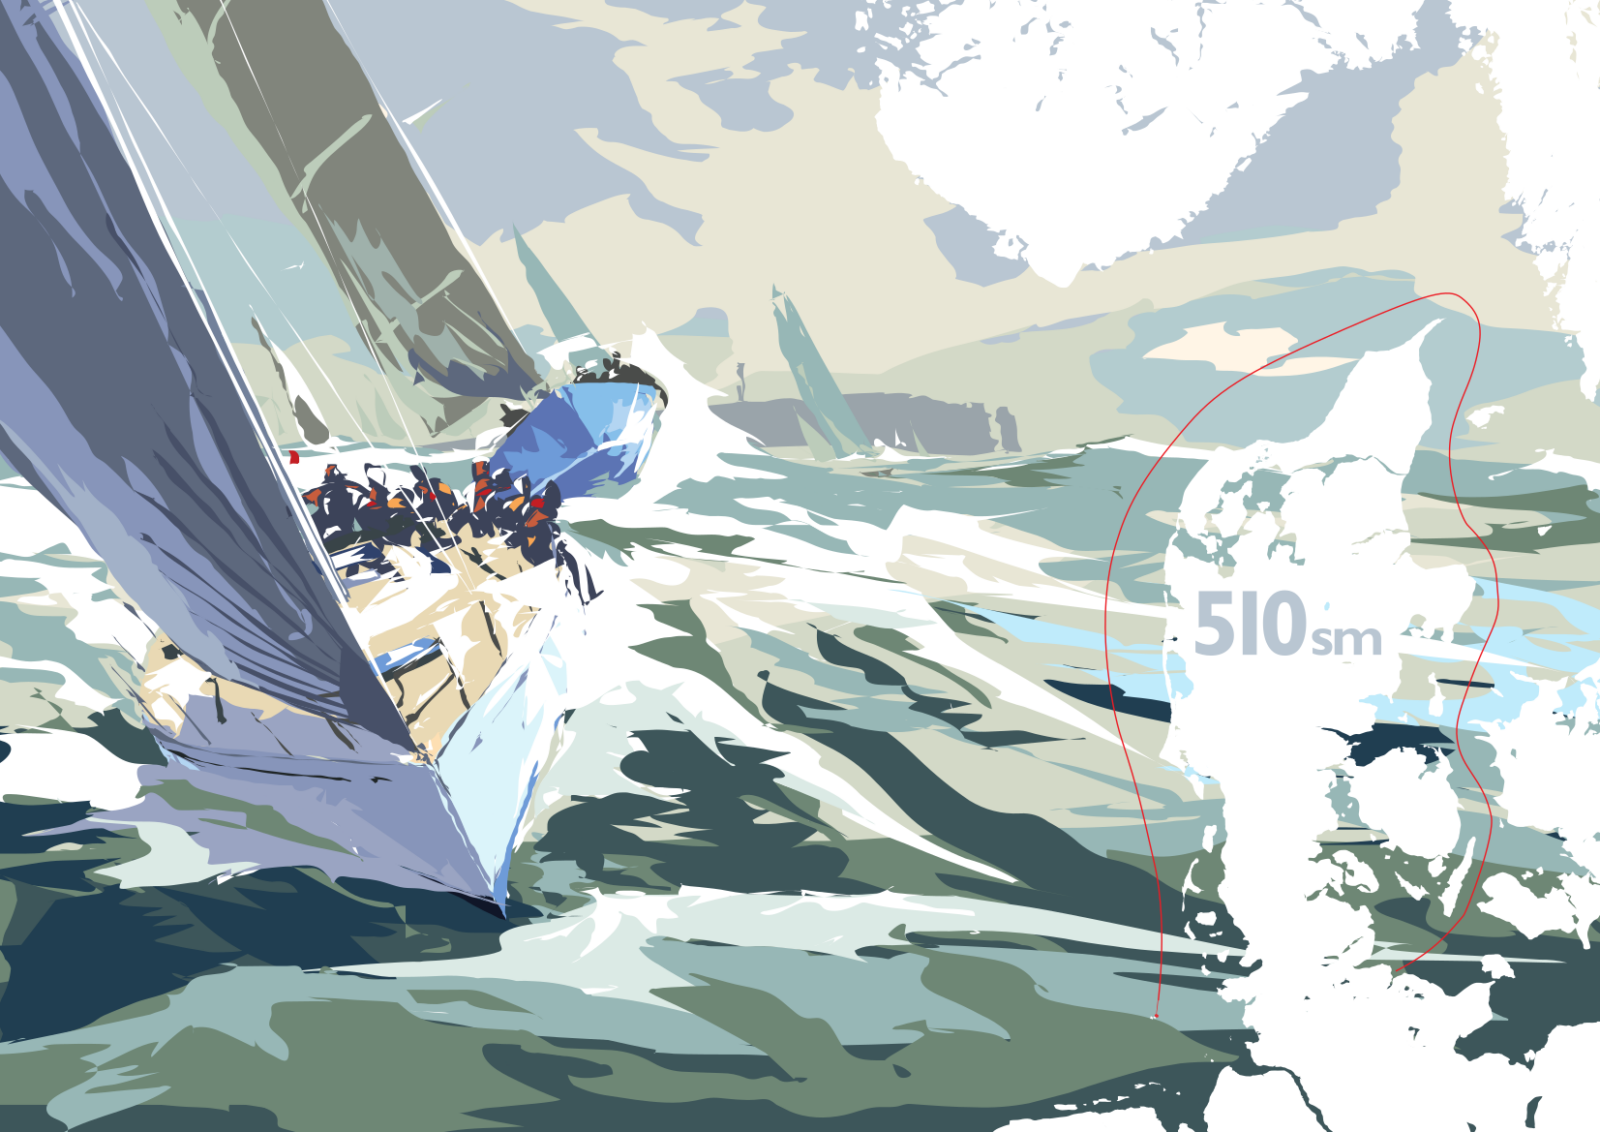 Pantaenius Rund Skagen